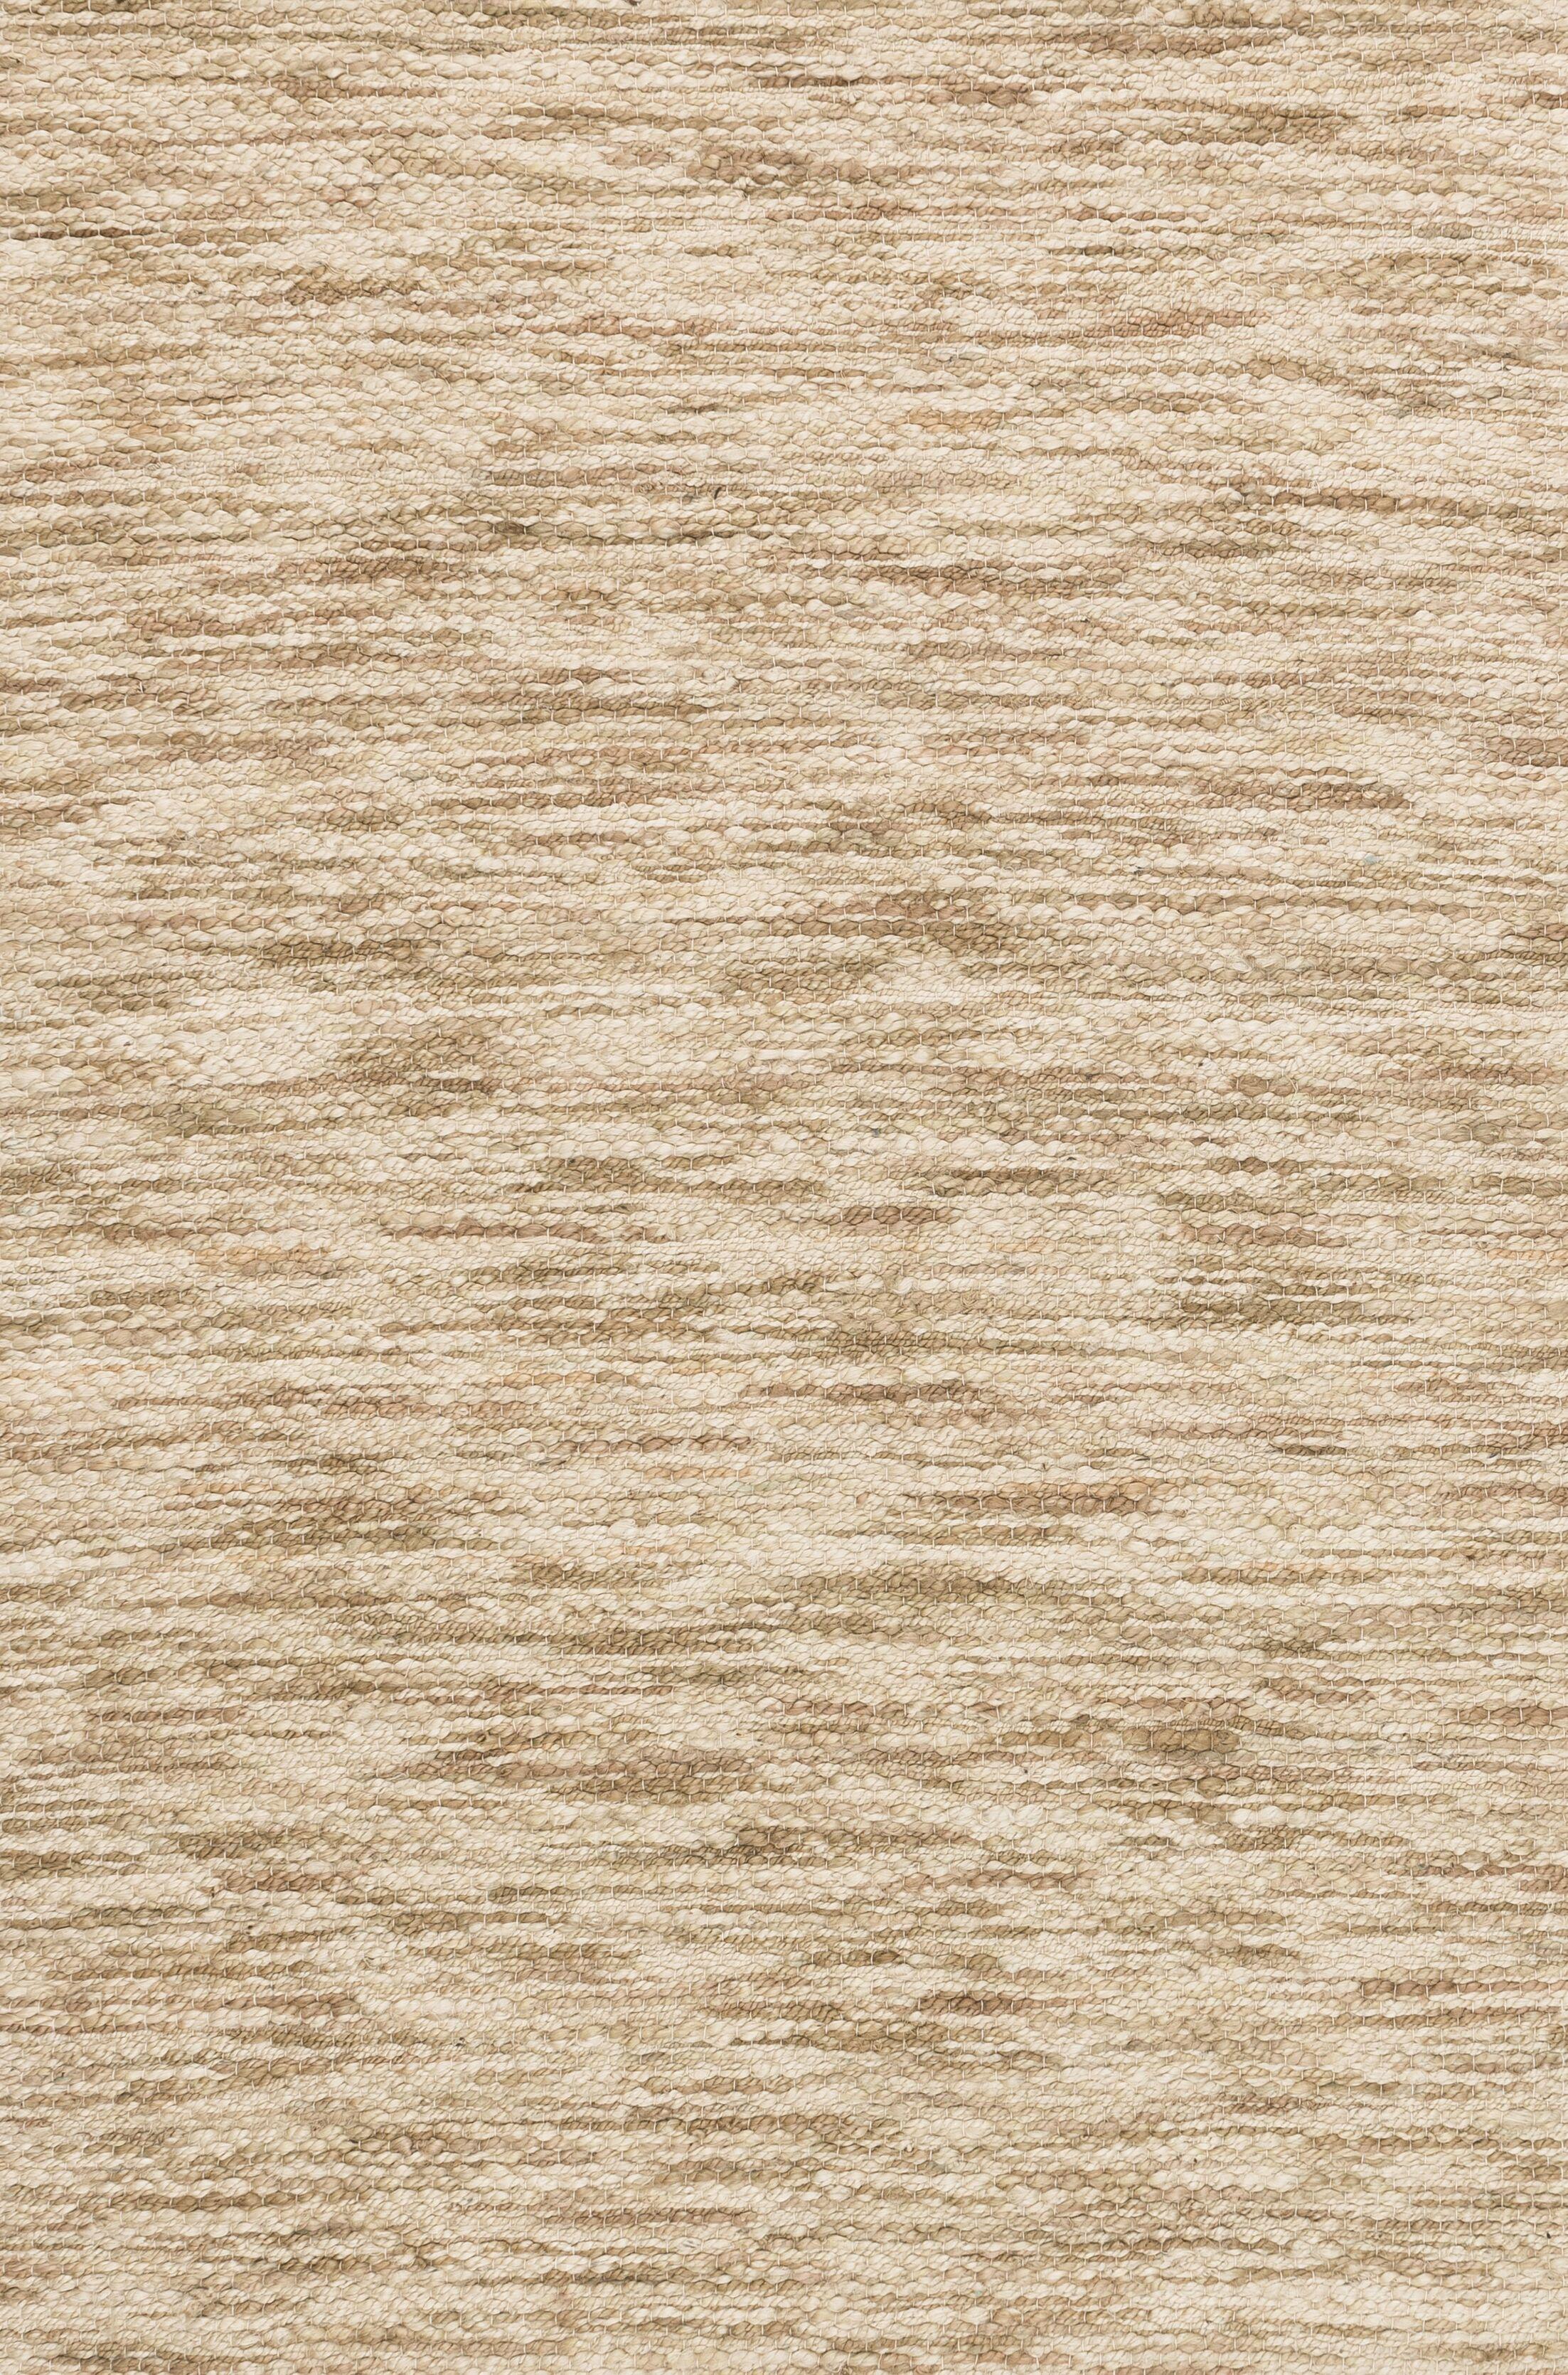 Turcios Hand-Woven Beige Area Rug Rug Size: Rectangle 5' x 7'6